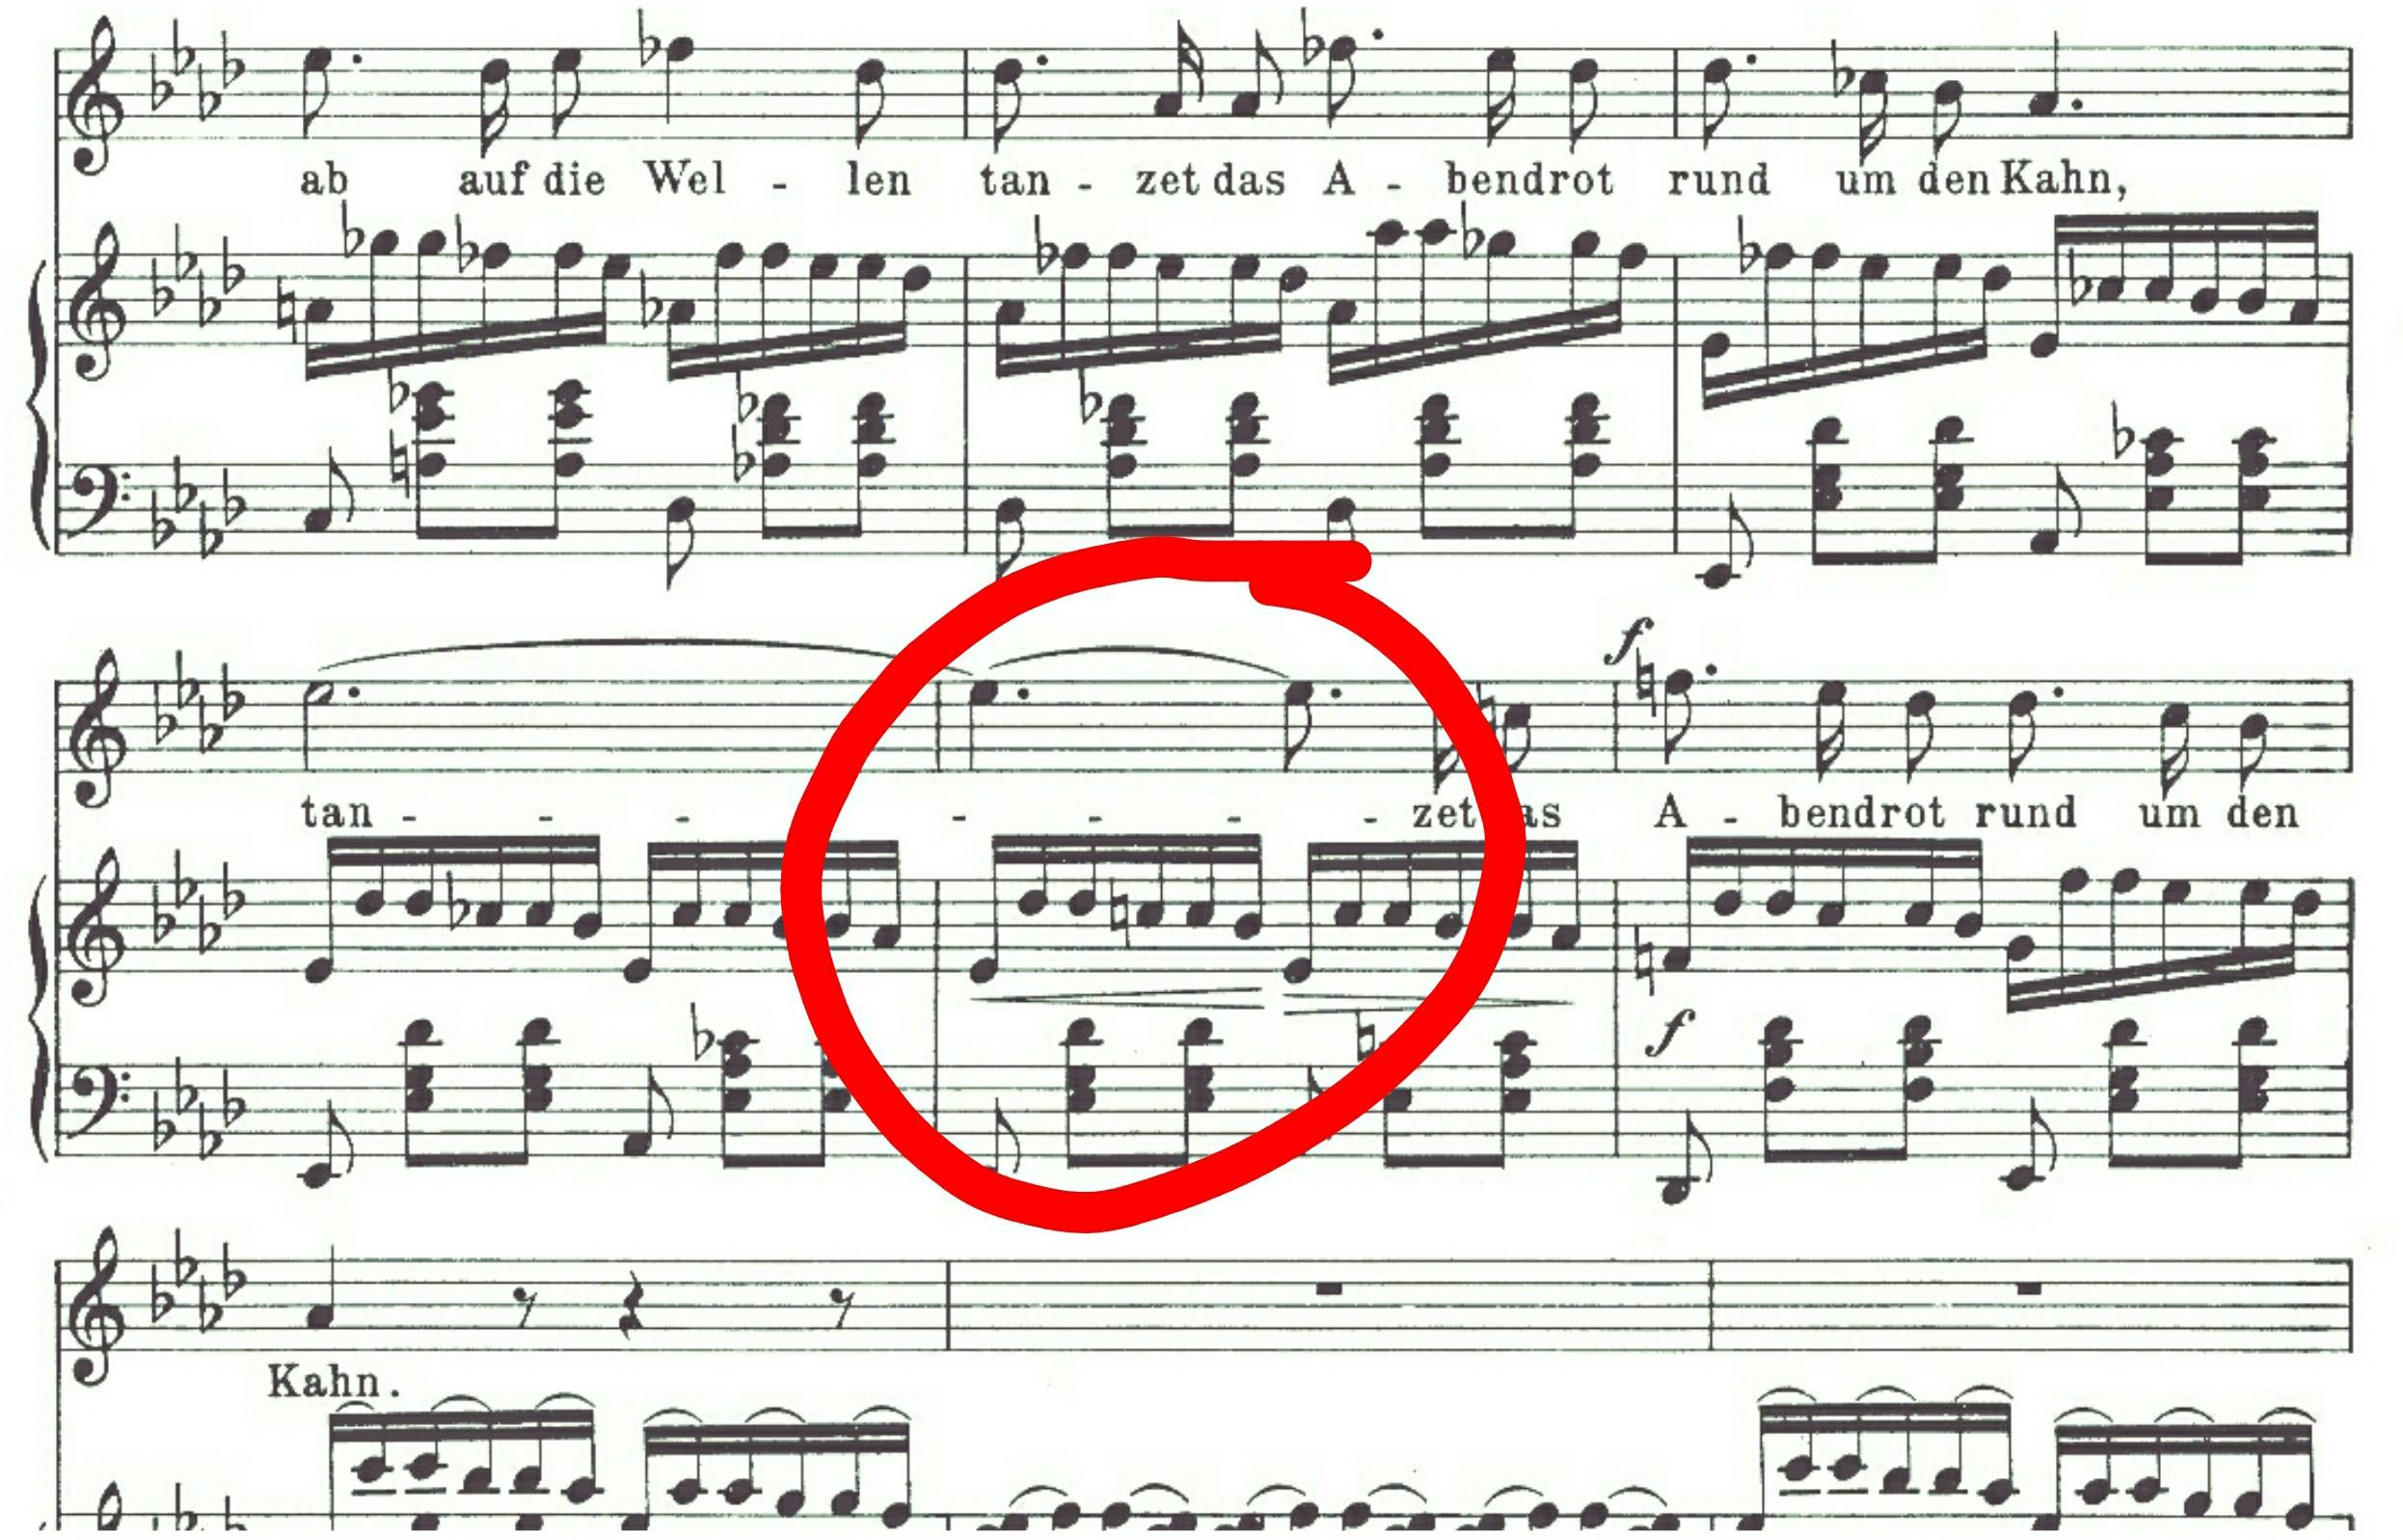 Schubert score